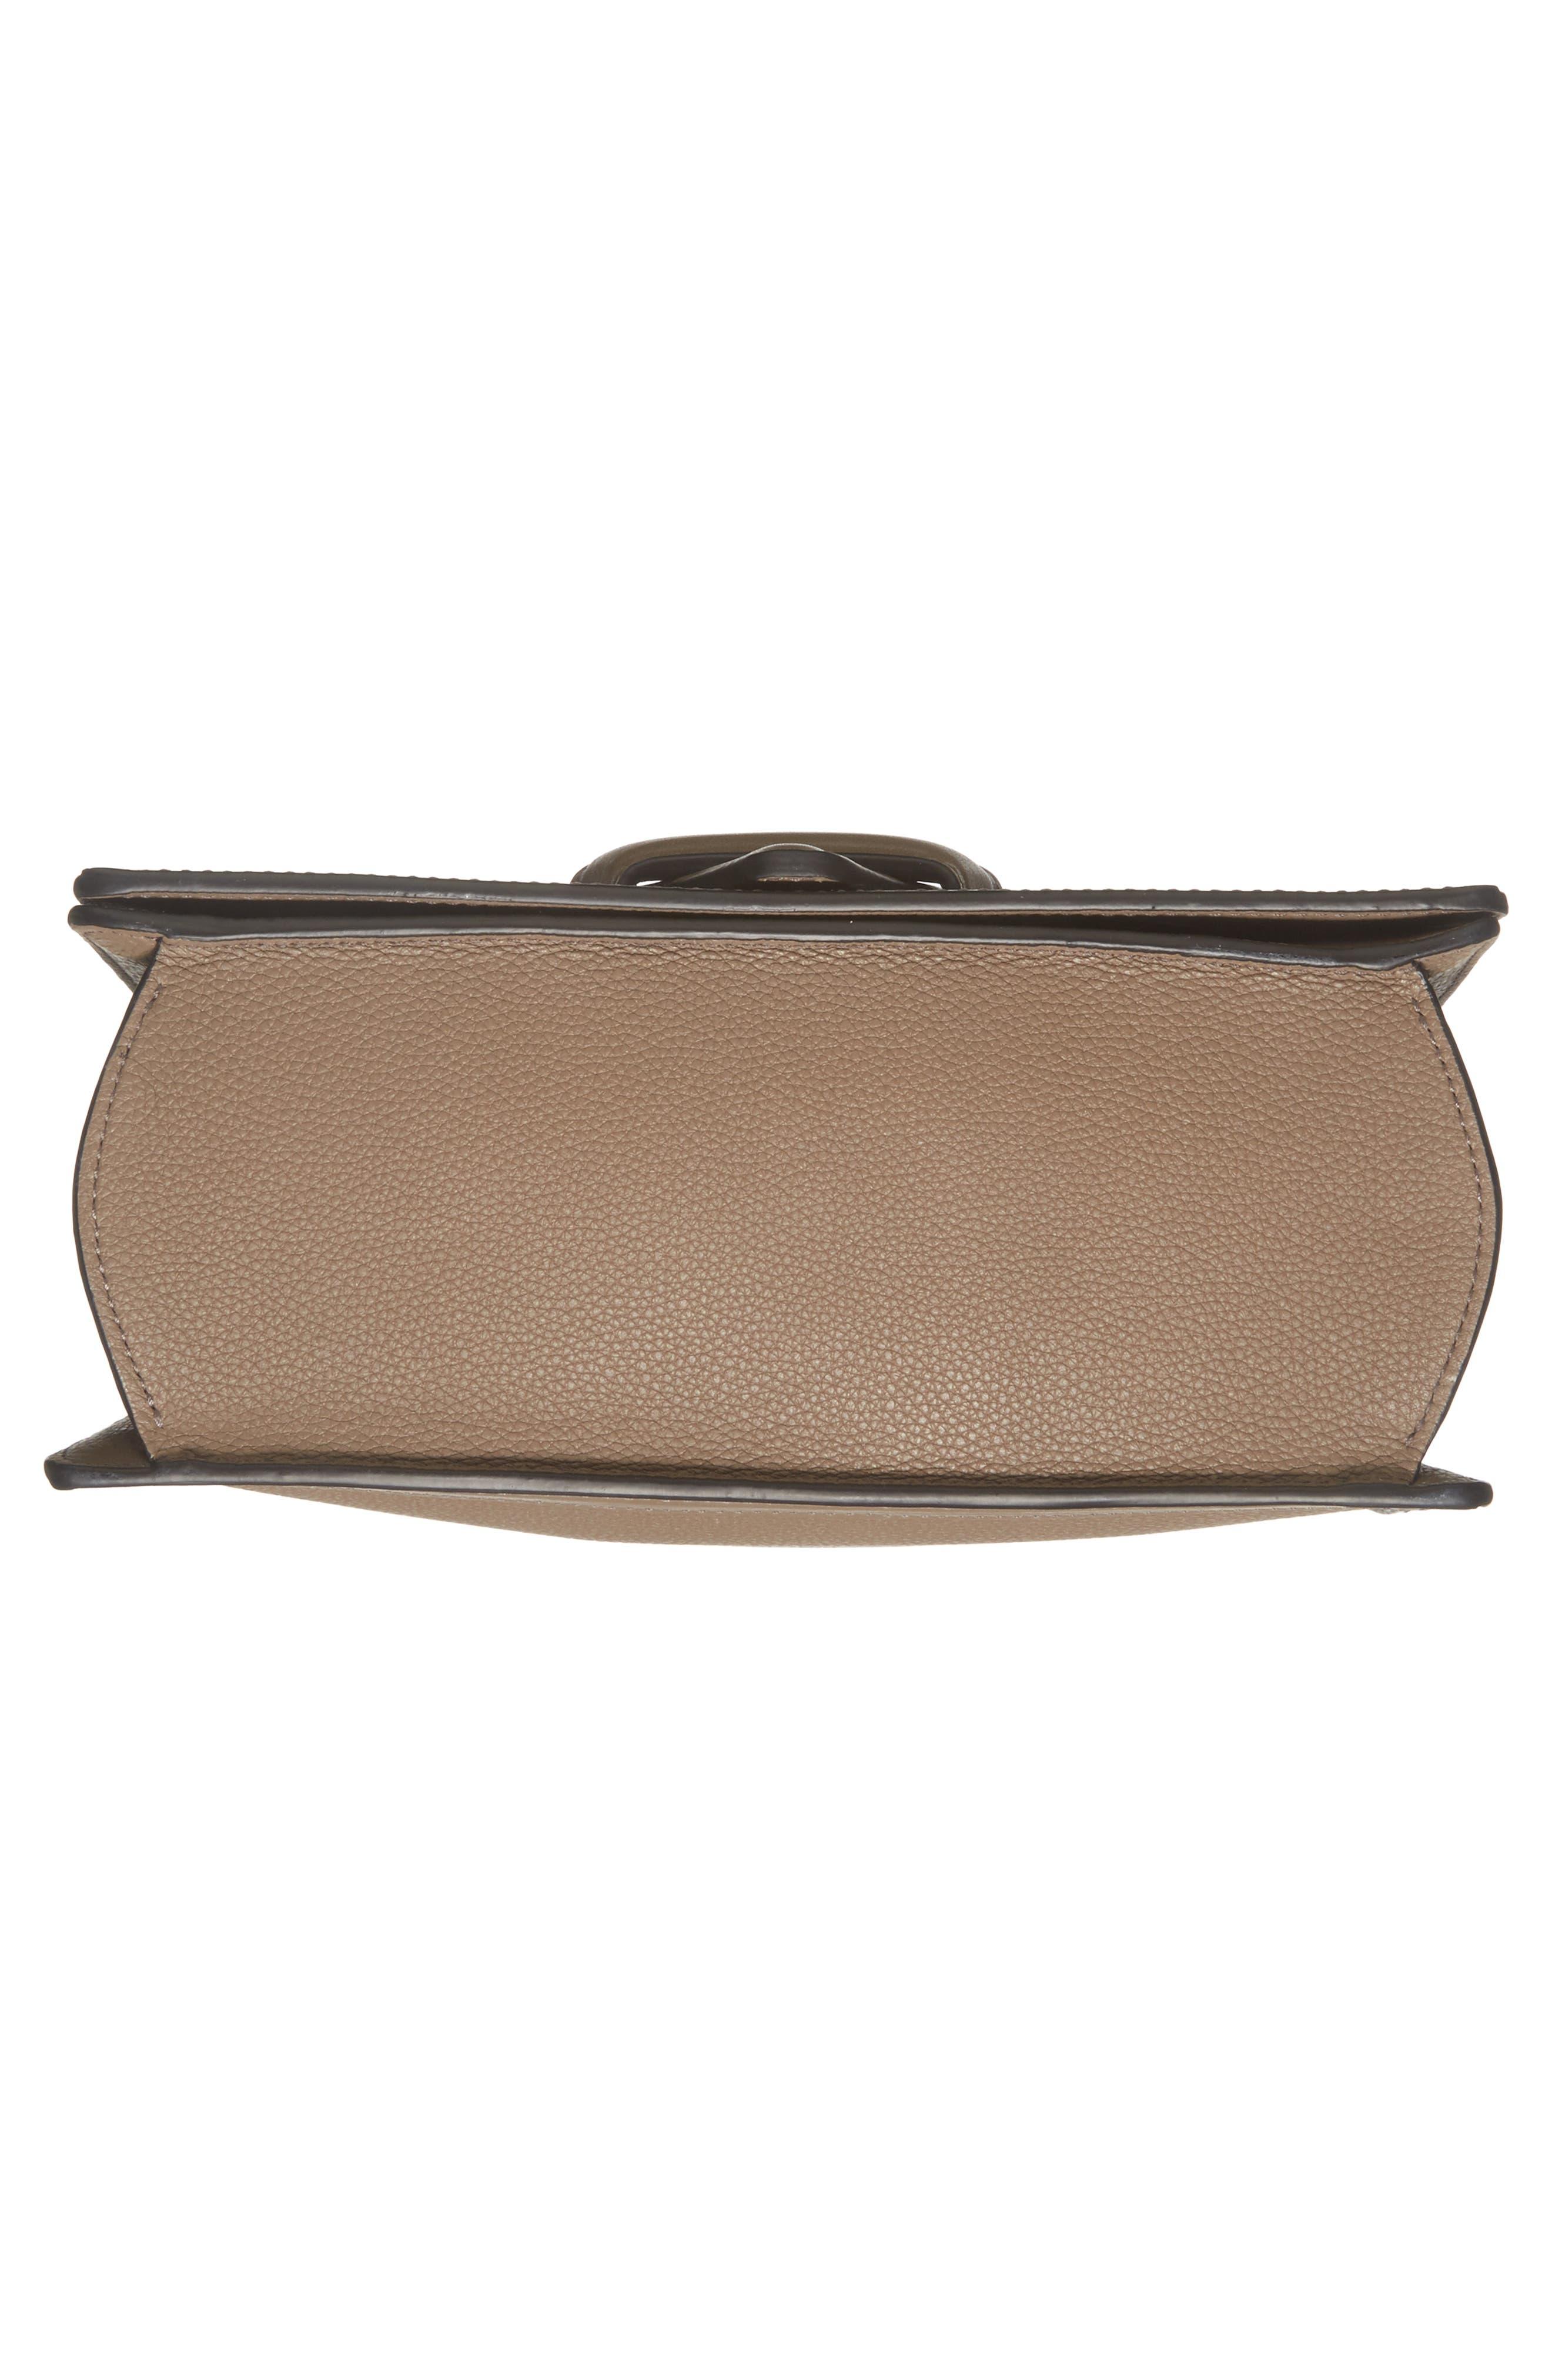 Medium Barcelona Leather Crossbody Bag,                             Alternate thumbnail 6, color,